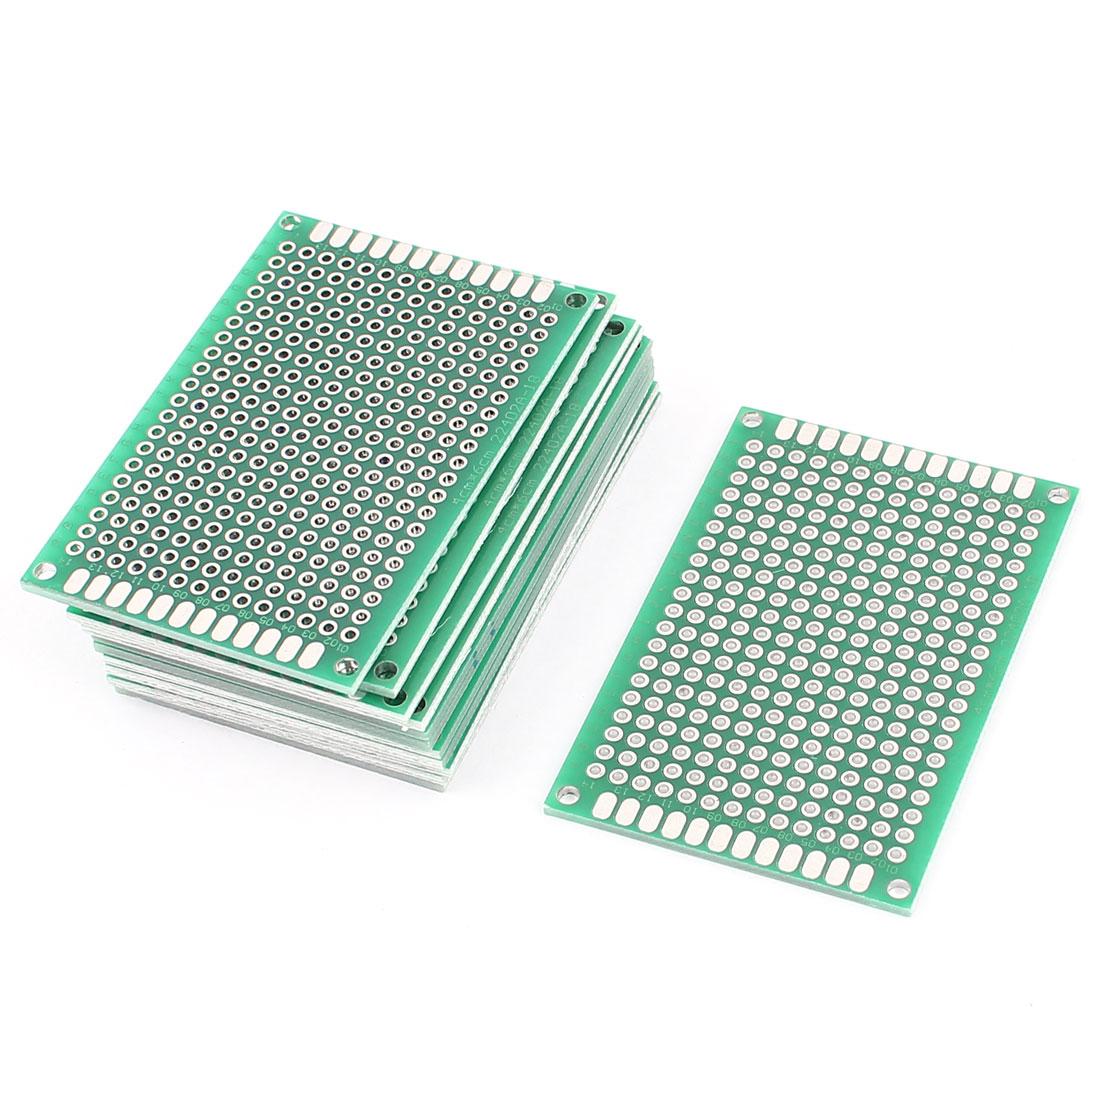 12Pcs 4cm x 6cm Electronic DIY Prototype Paper Double Side PCB Universal Board